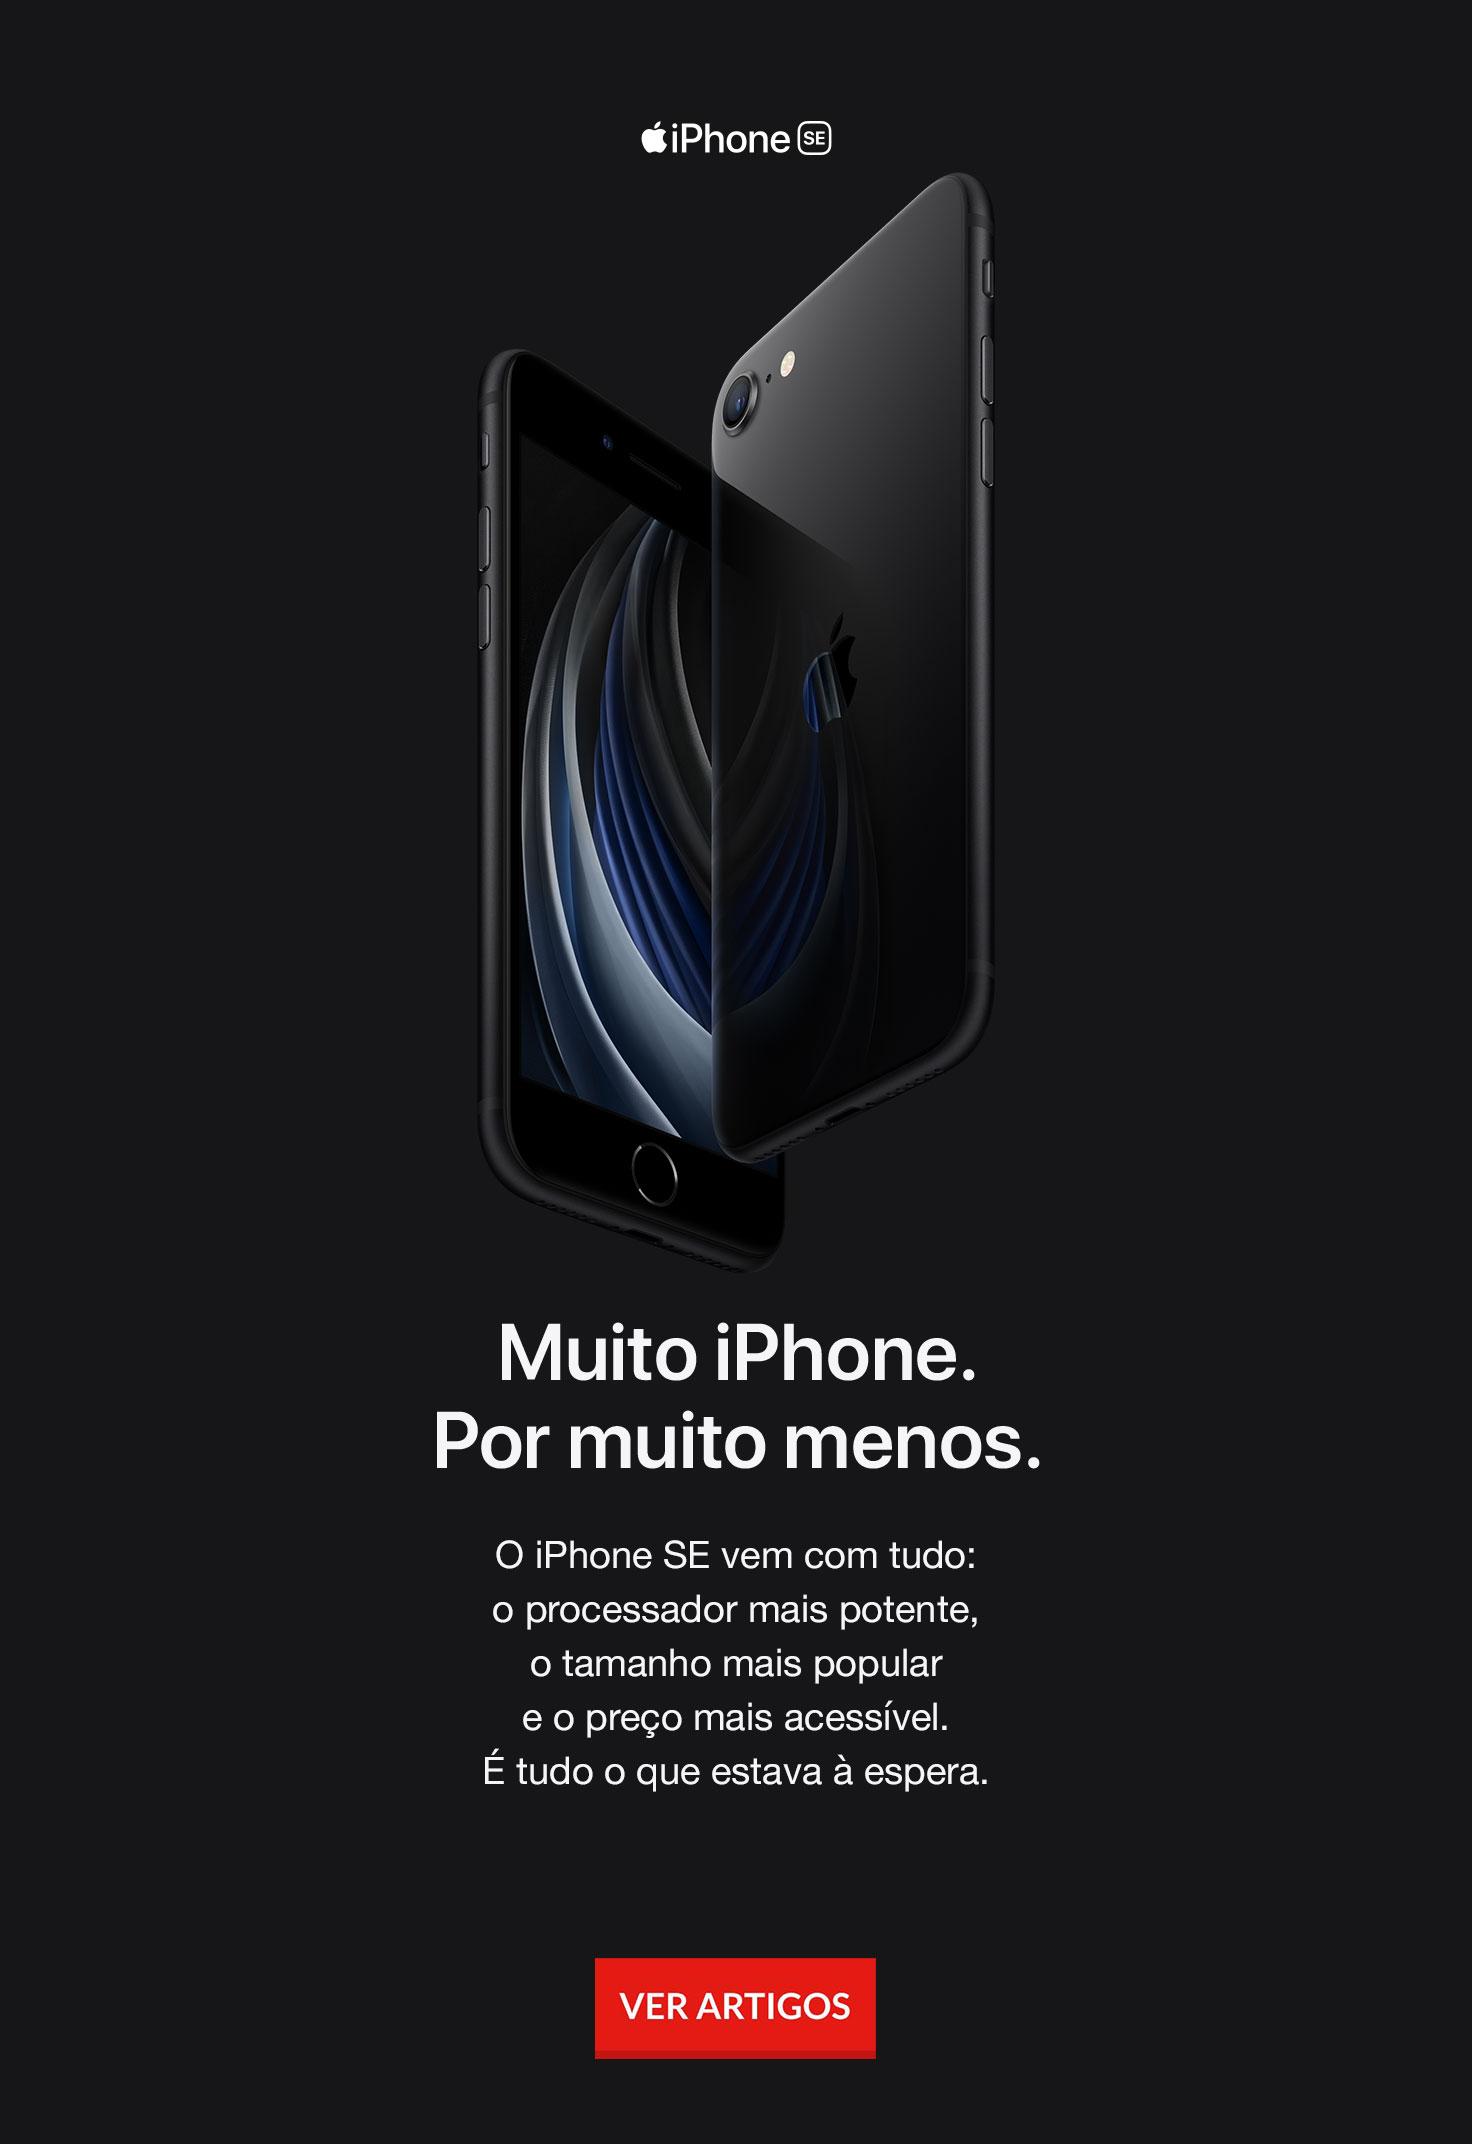 iPhone SE em preto